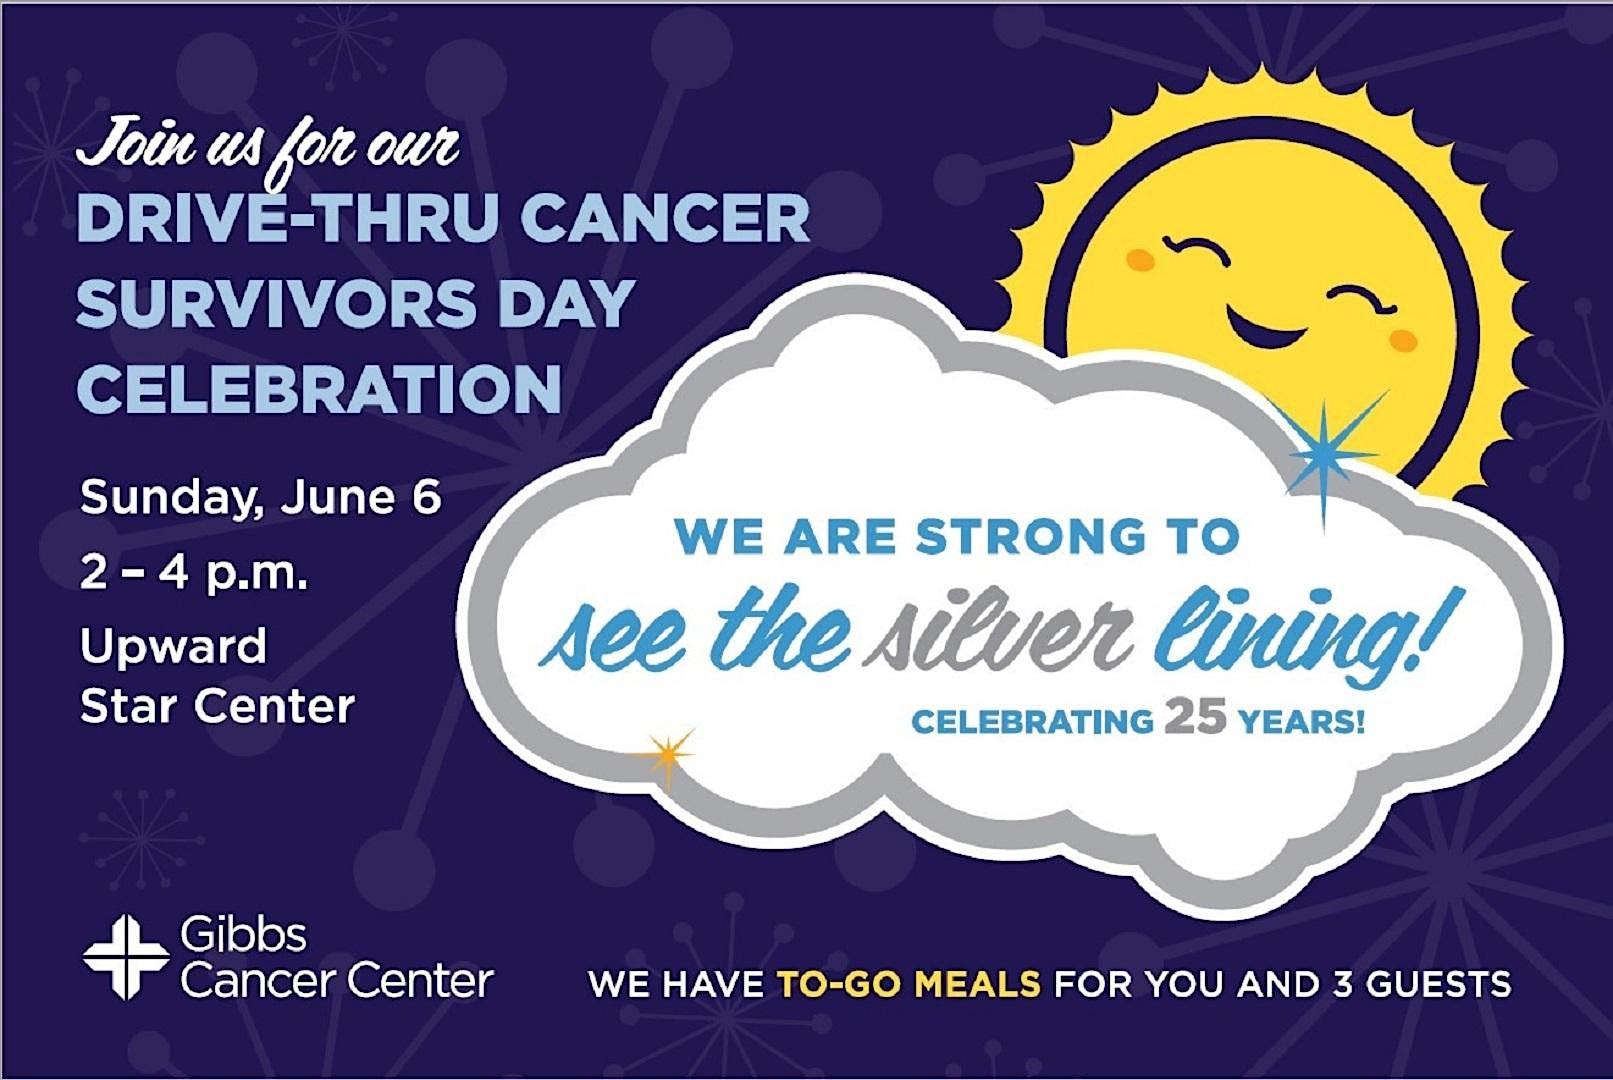 Cancer Survivors Day - Drive-Thru Celebration